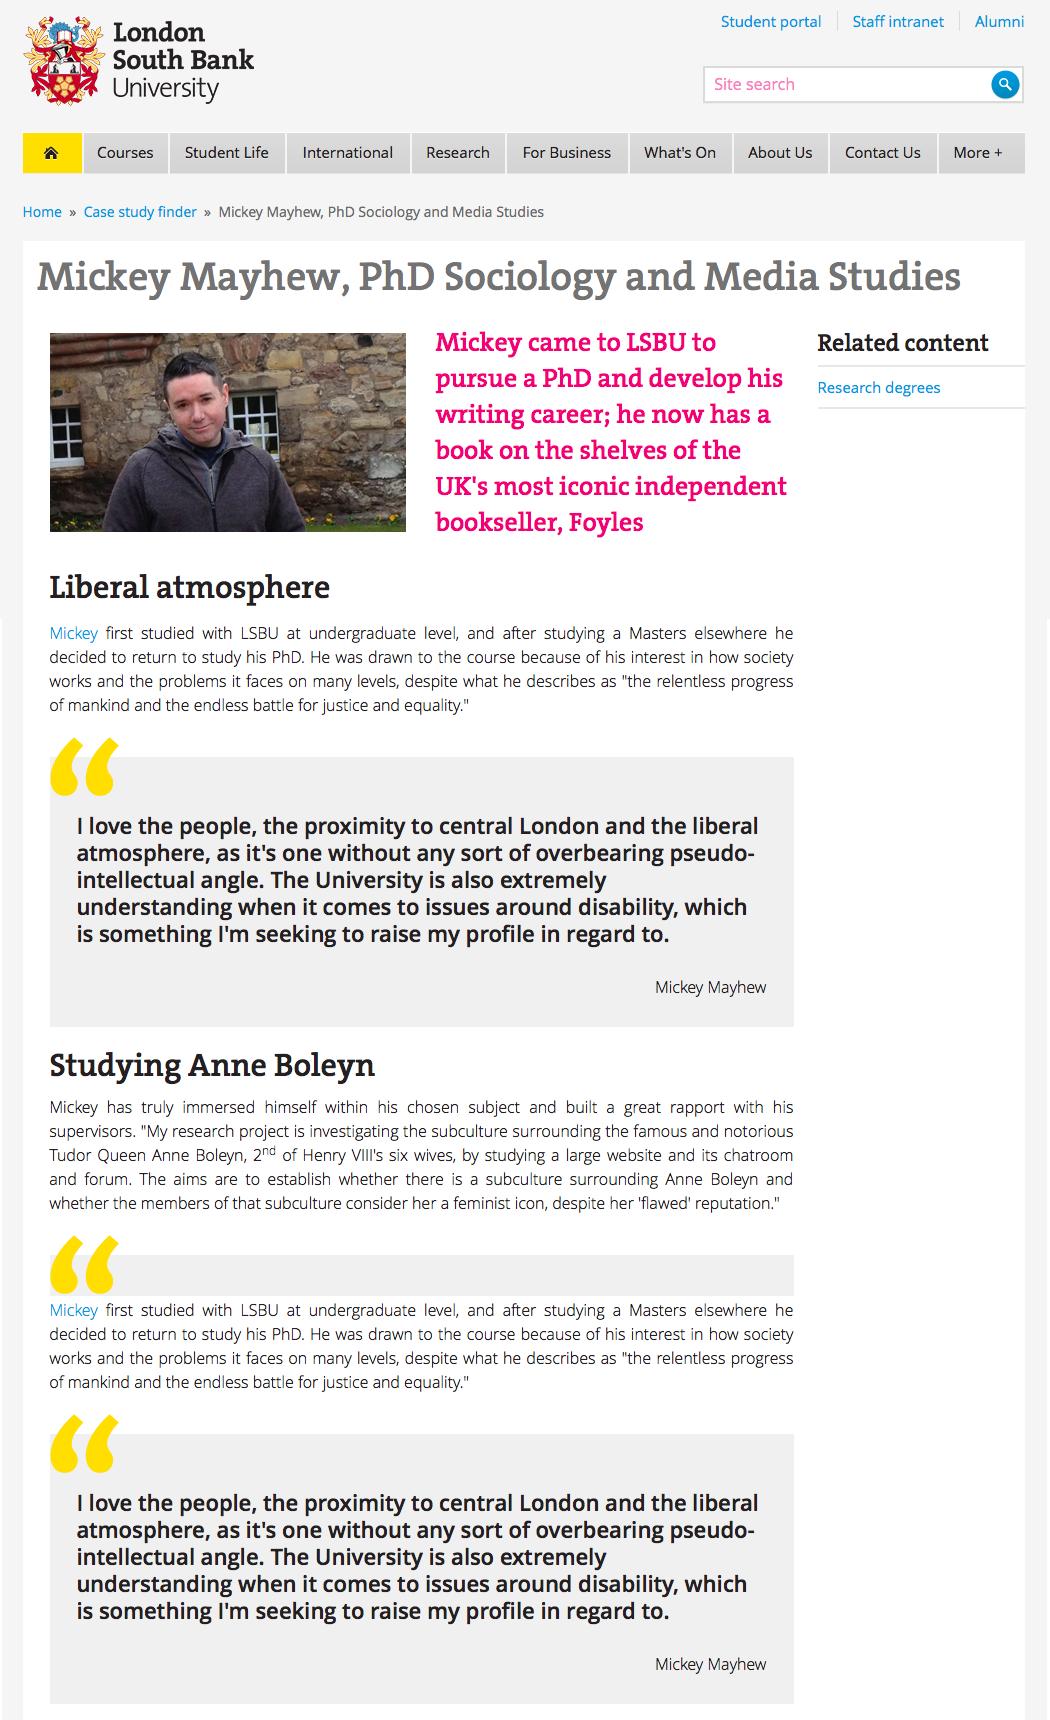 LSBU Mickey Mayhew PhD Student Feature Article